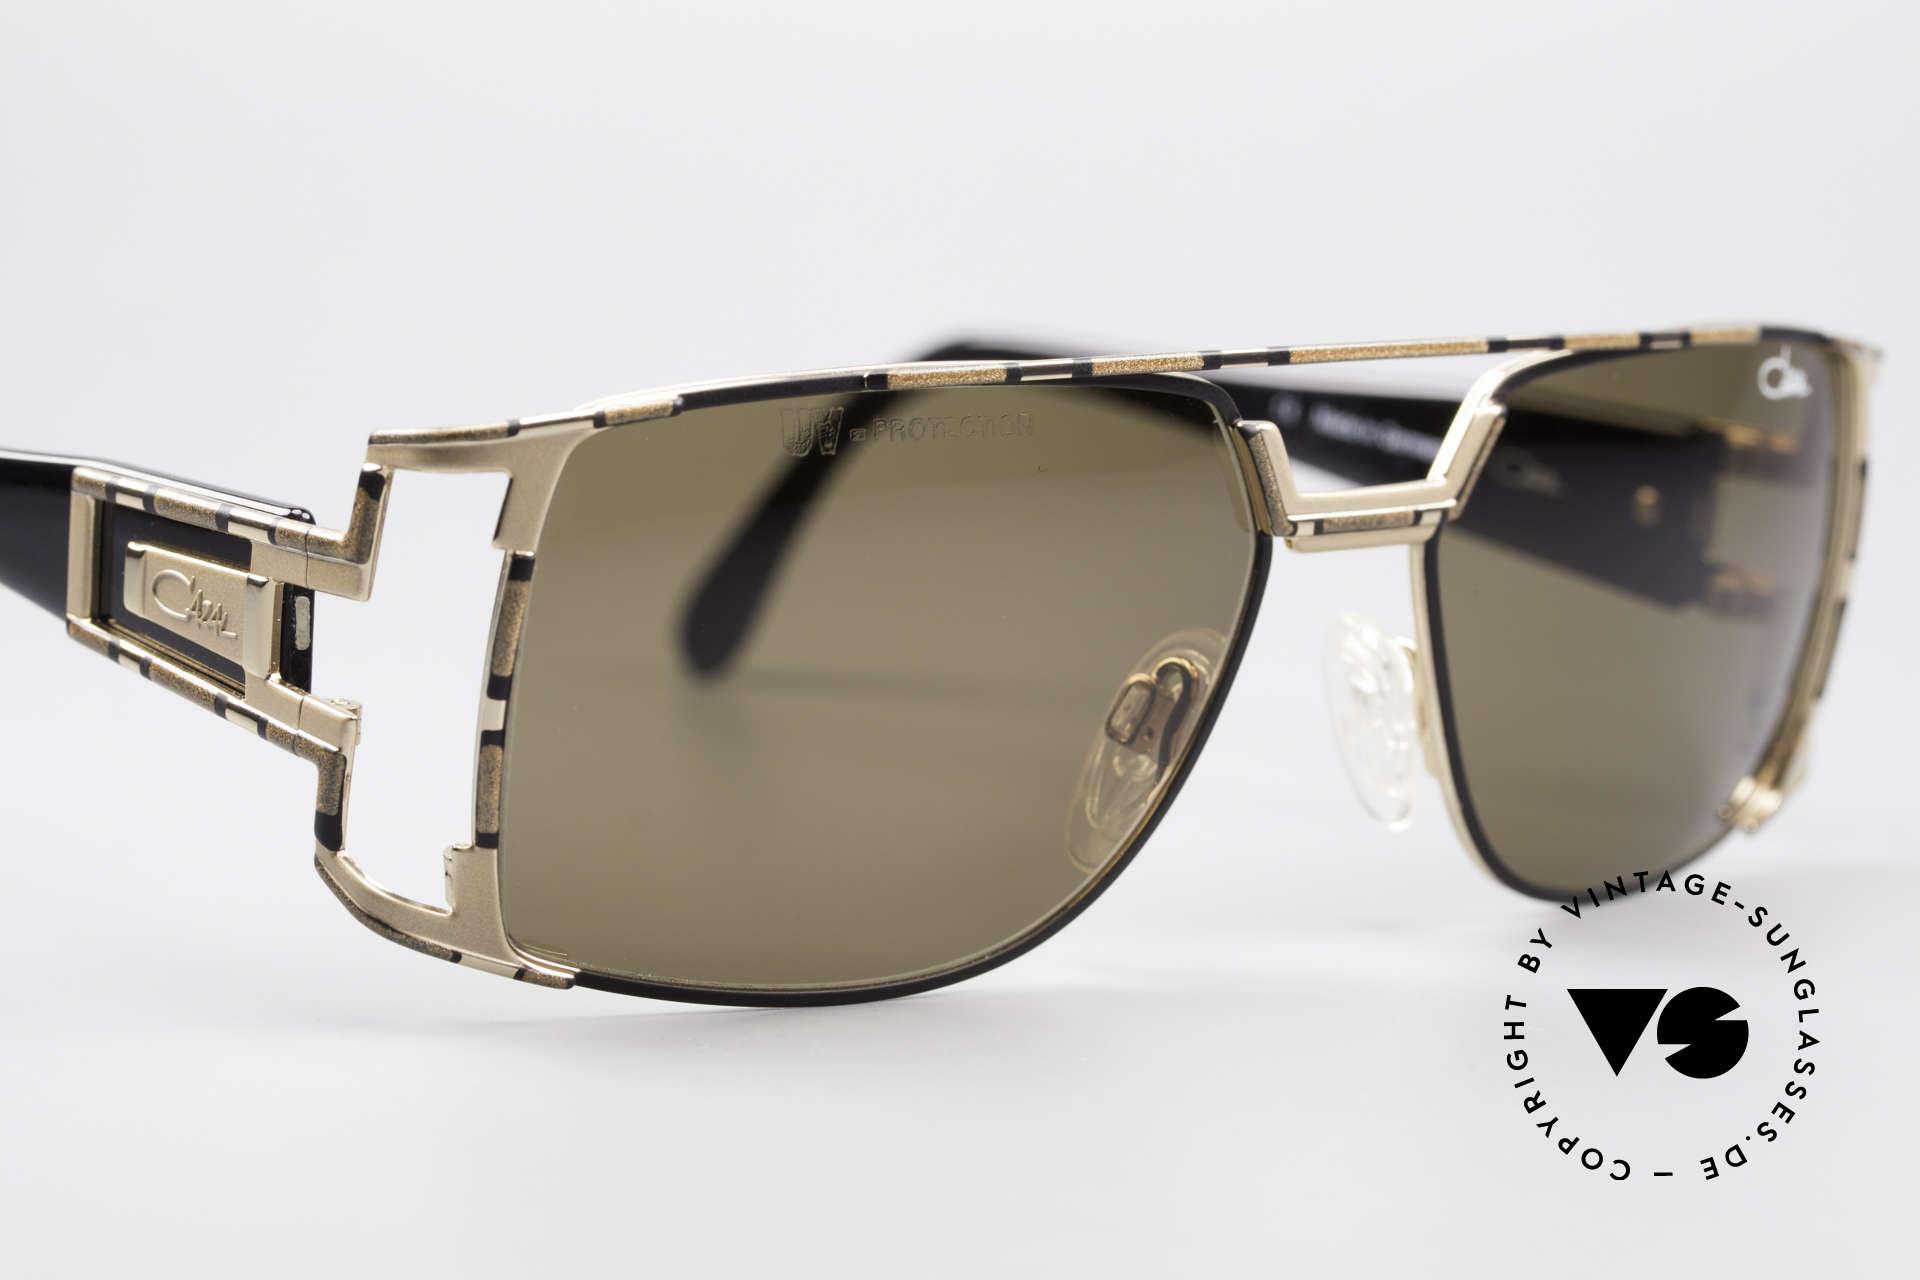 Cazal 974 Unisex Design Men Women, unworn, NOS (like all our rare vintage CAZAL eyewear), Made for Men and Women